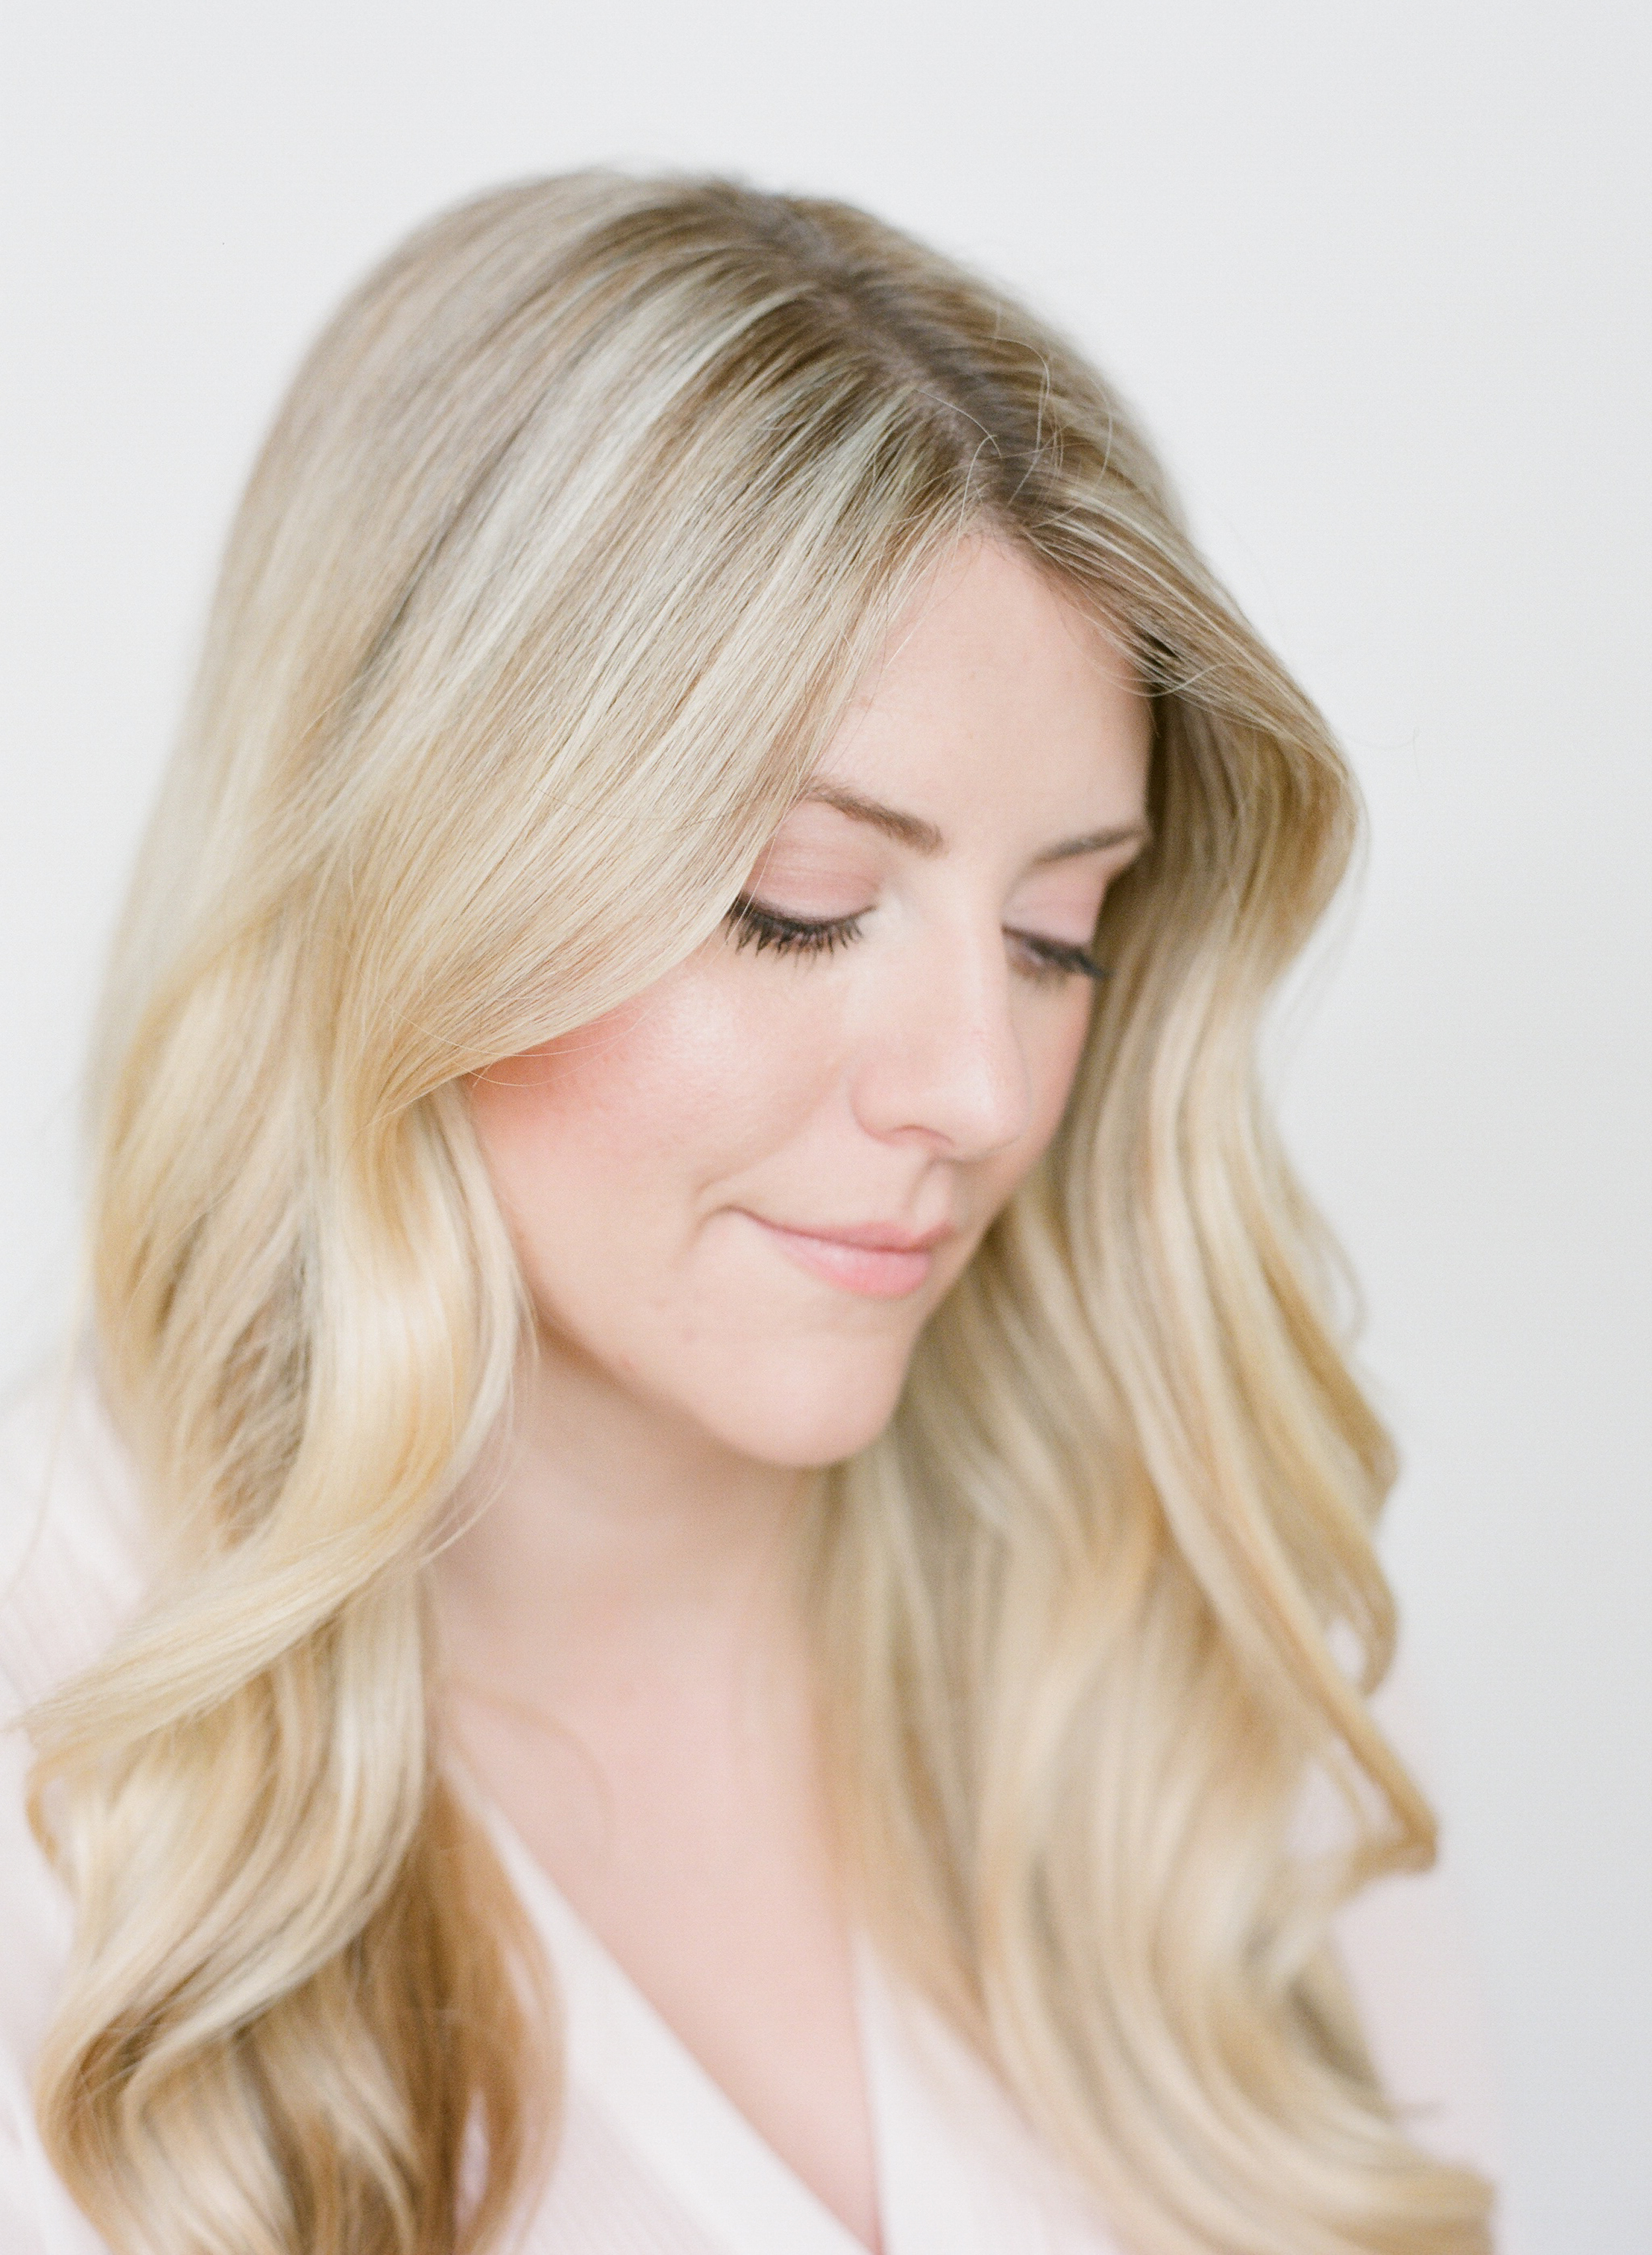 KatieElwood-Vancouver-Makeup-artist_Portraits.JPG